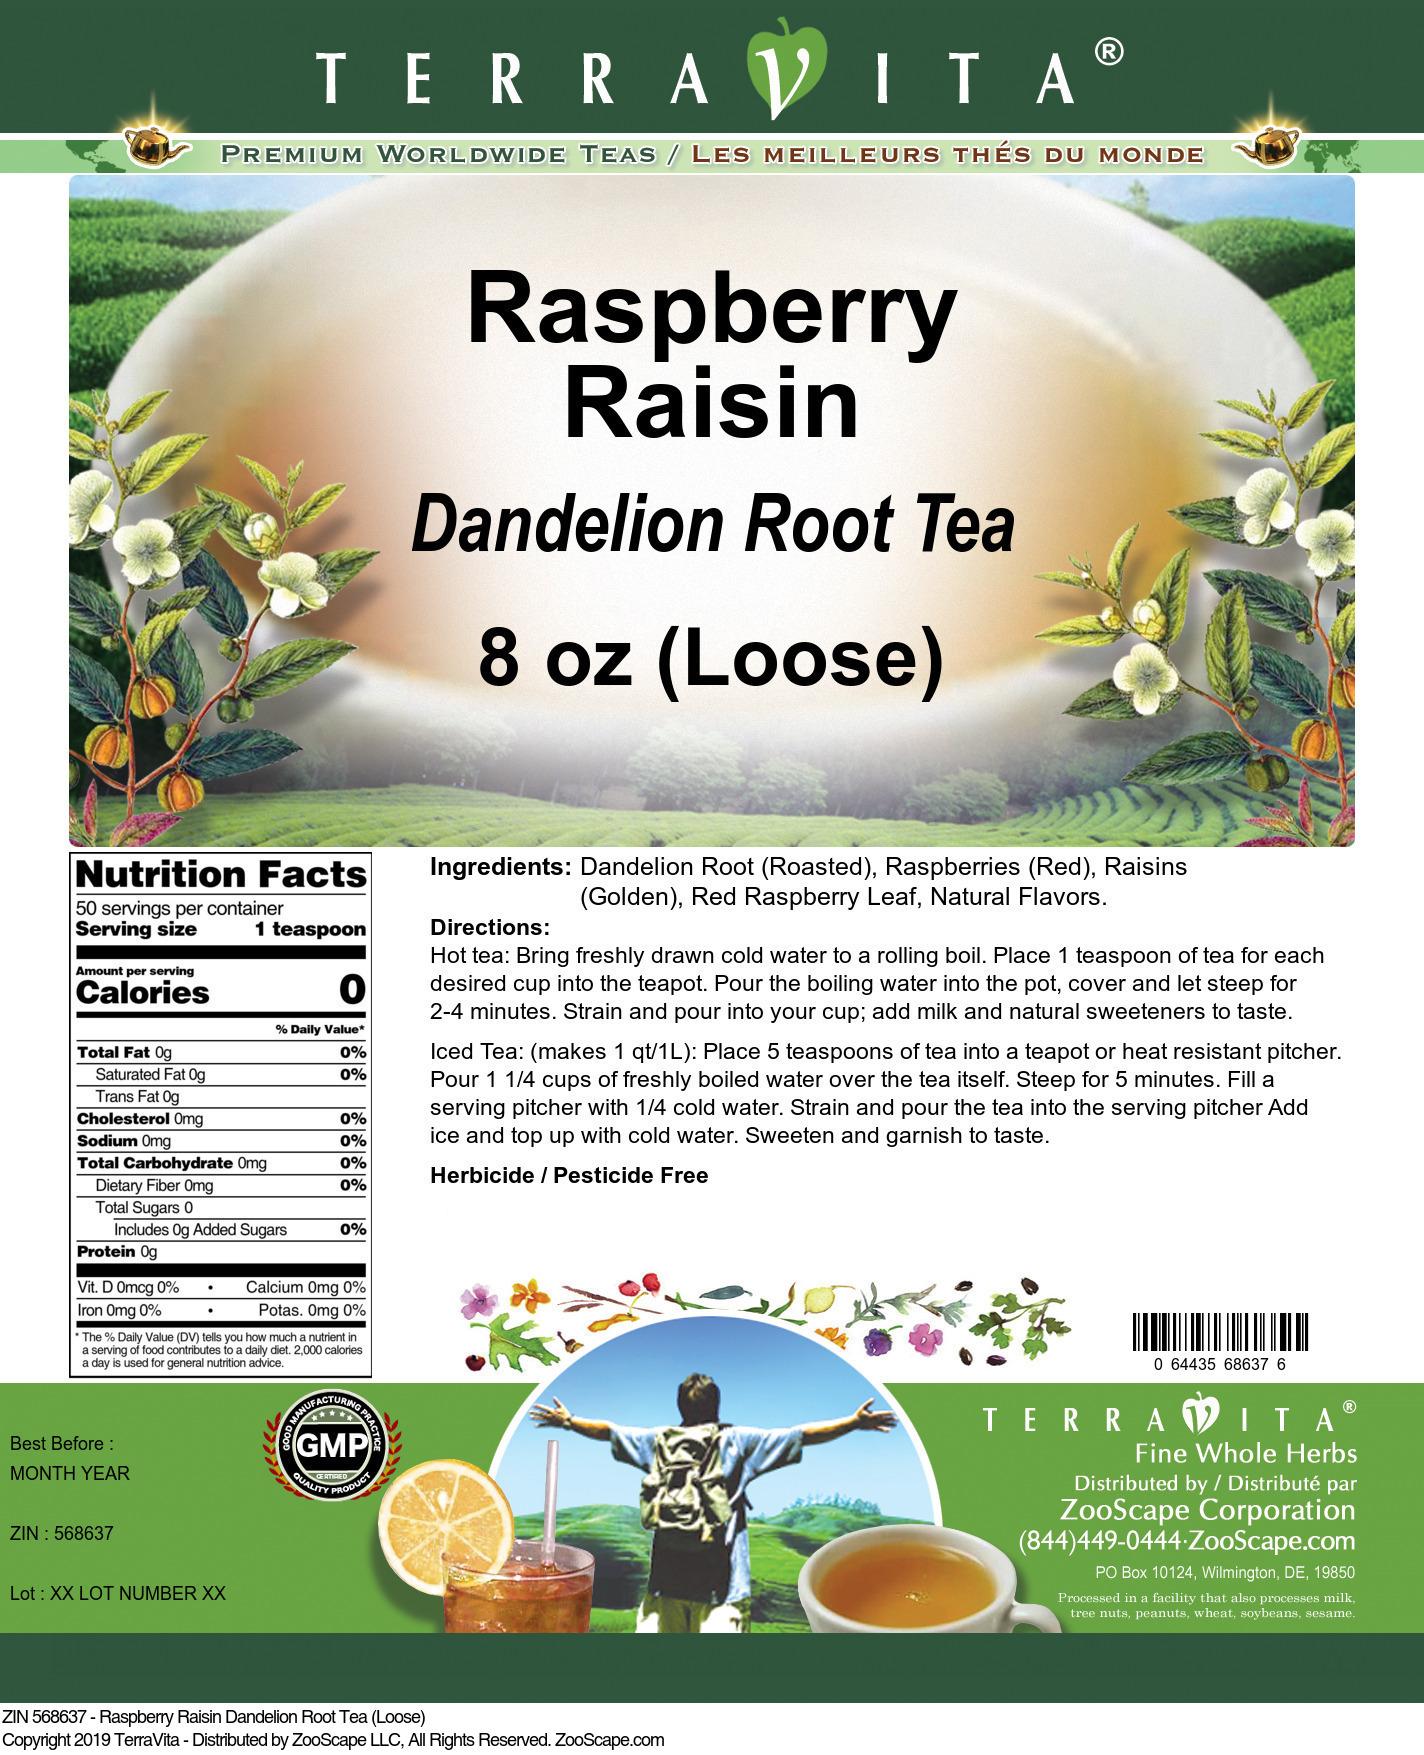 Raspberry Raisin Dandelion Root